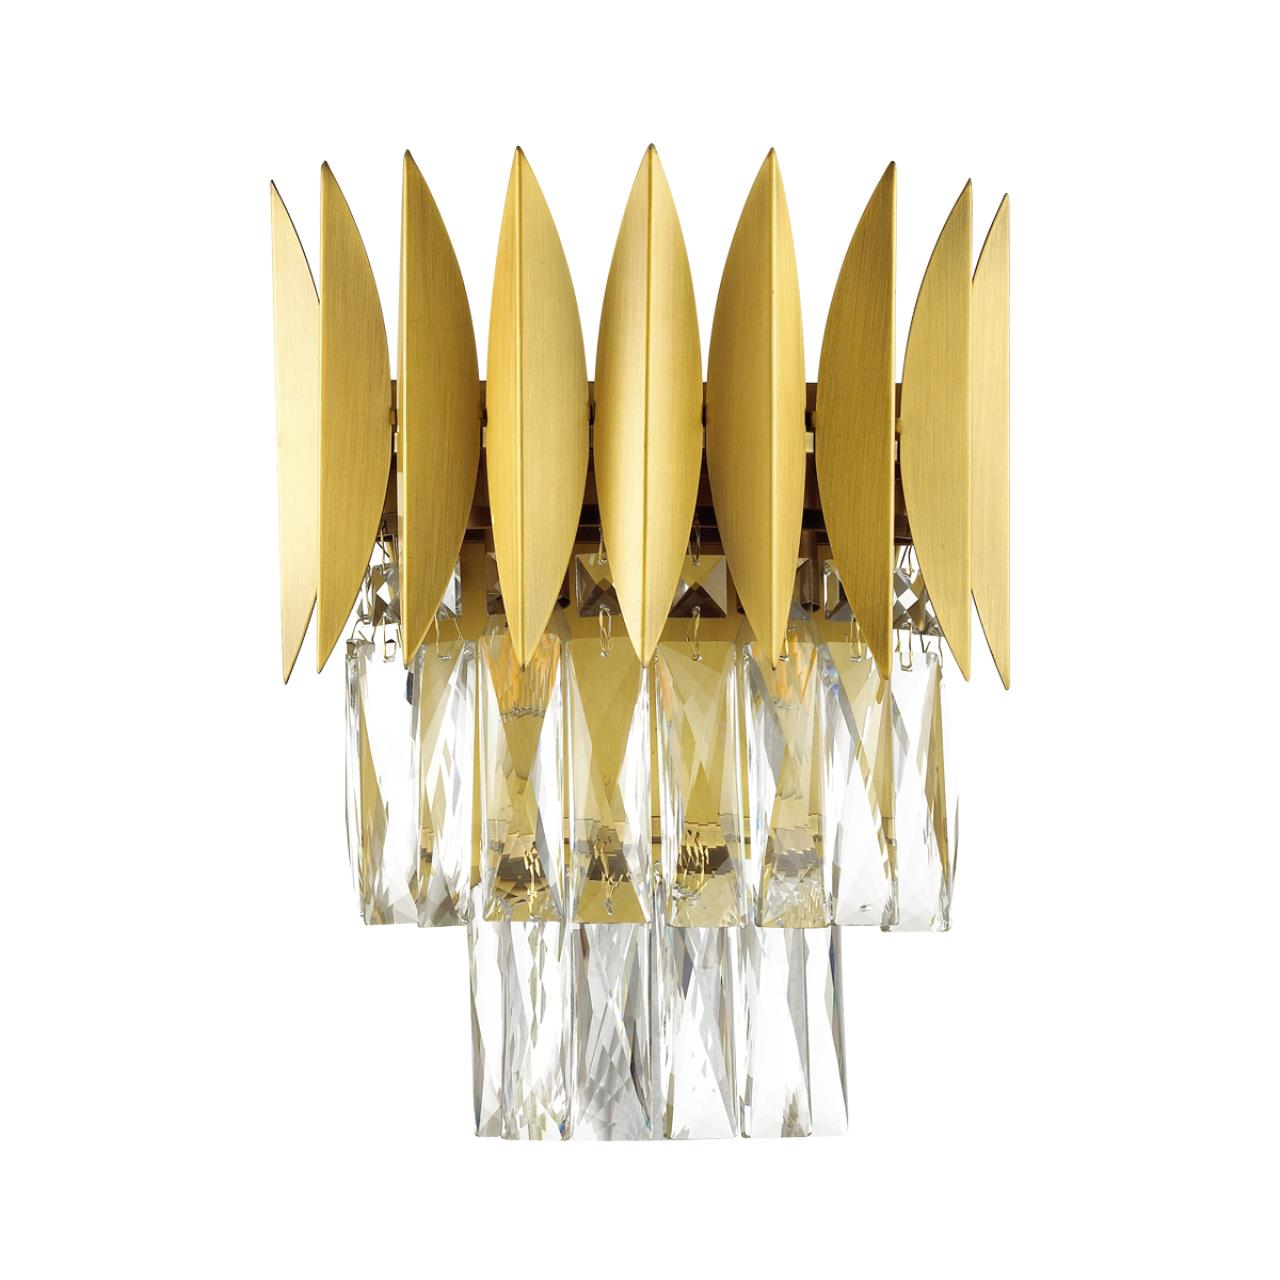 Бра Odeon Light VALETTA 4124/2W настенный светильник odeon light valetta 4124 2w 80 вт